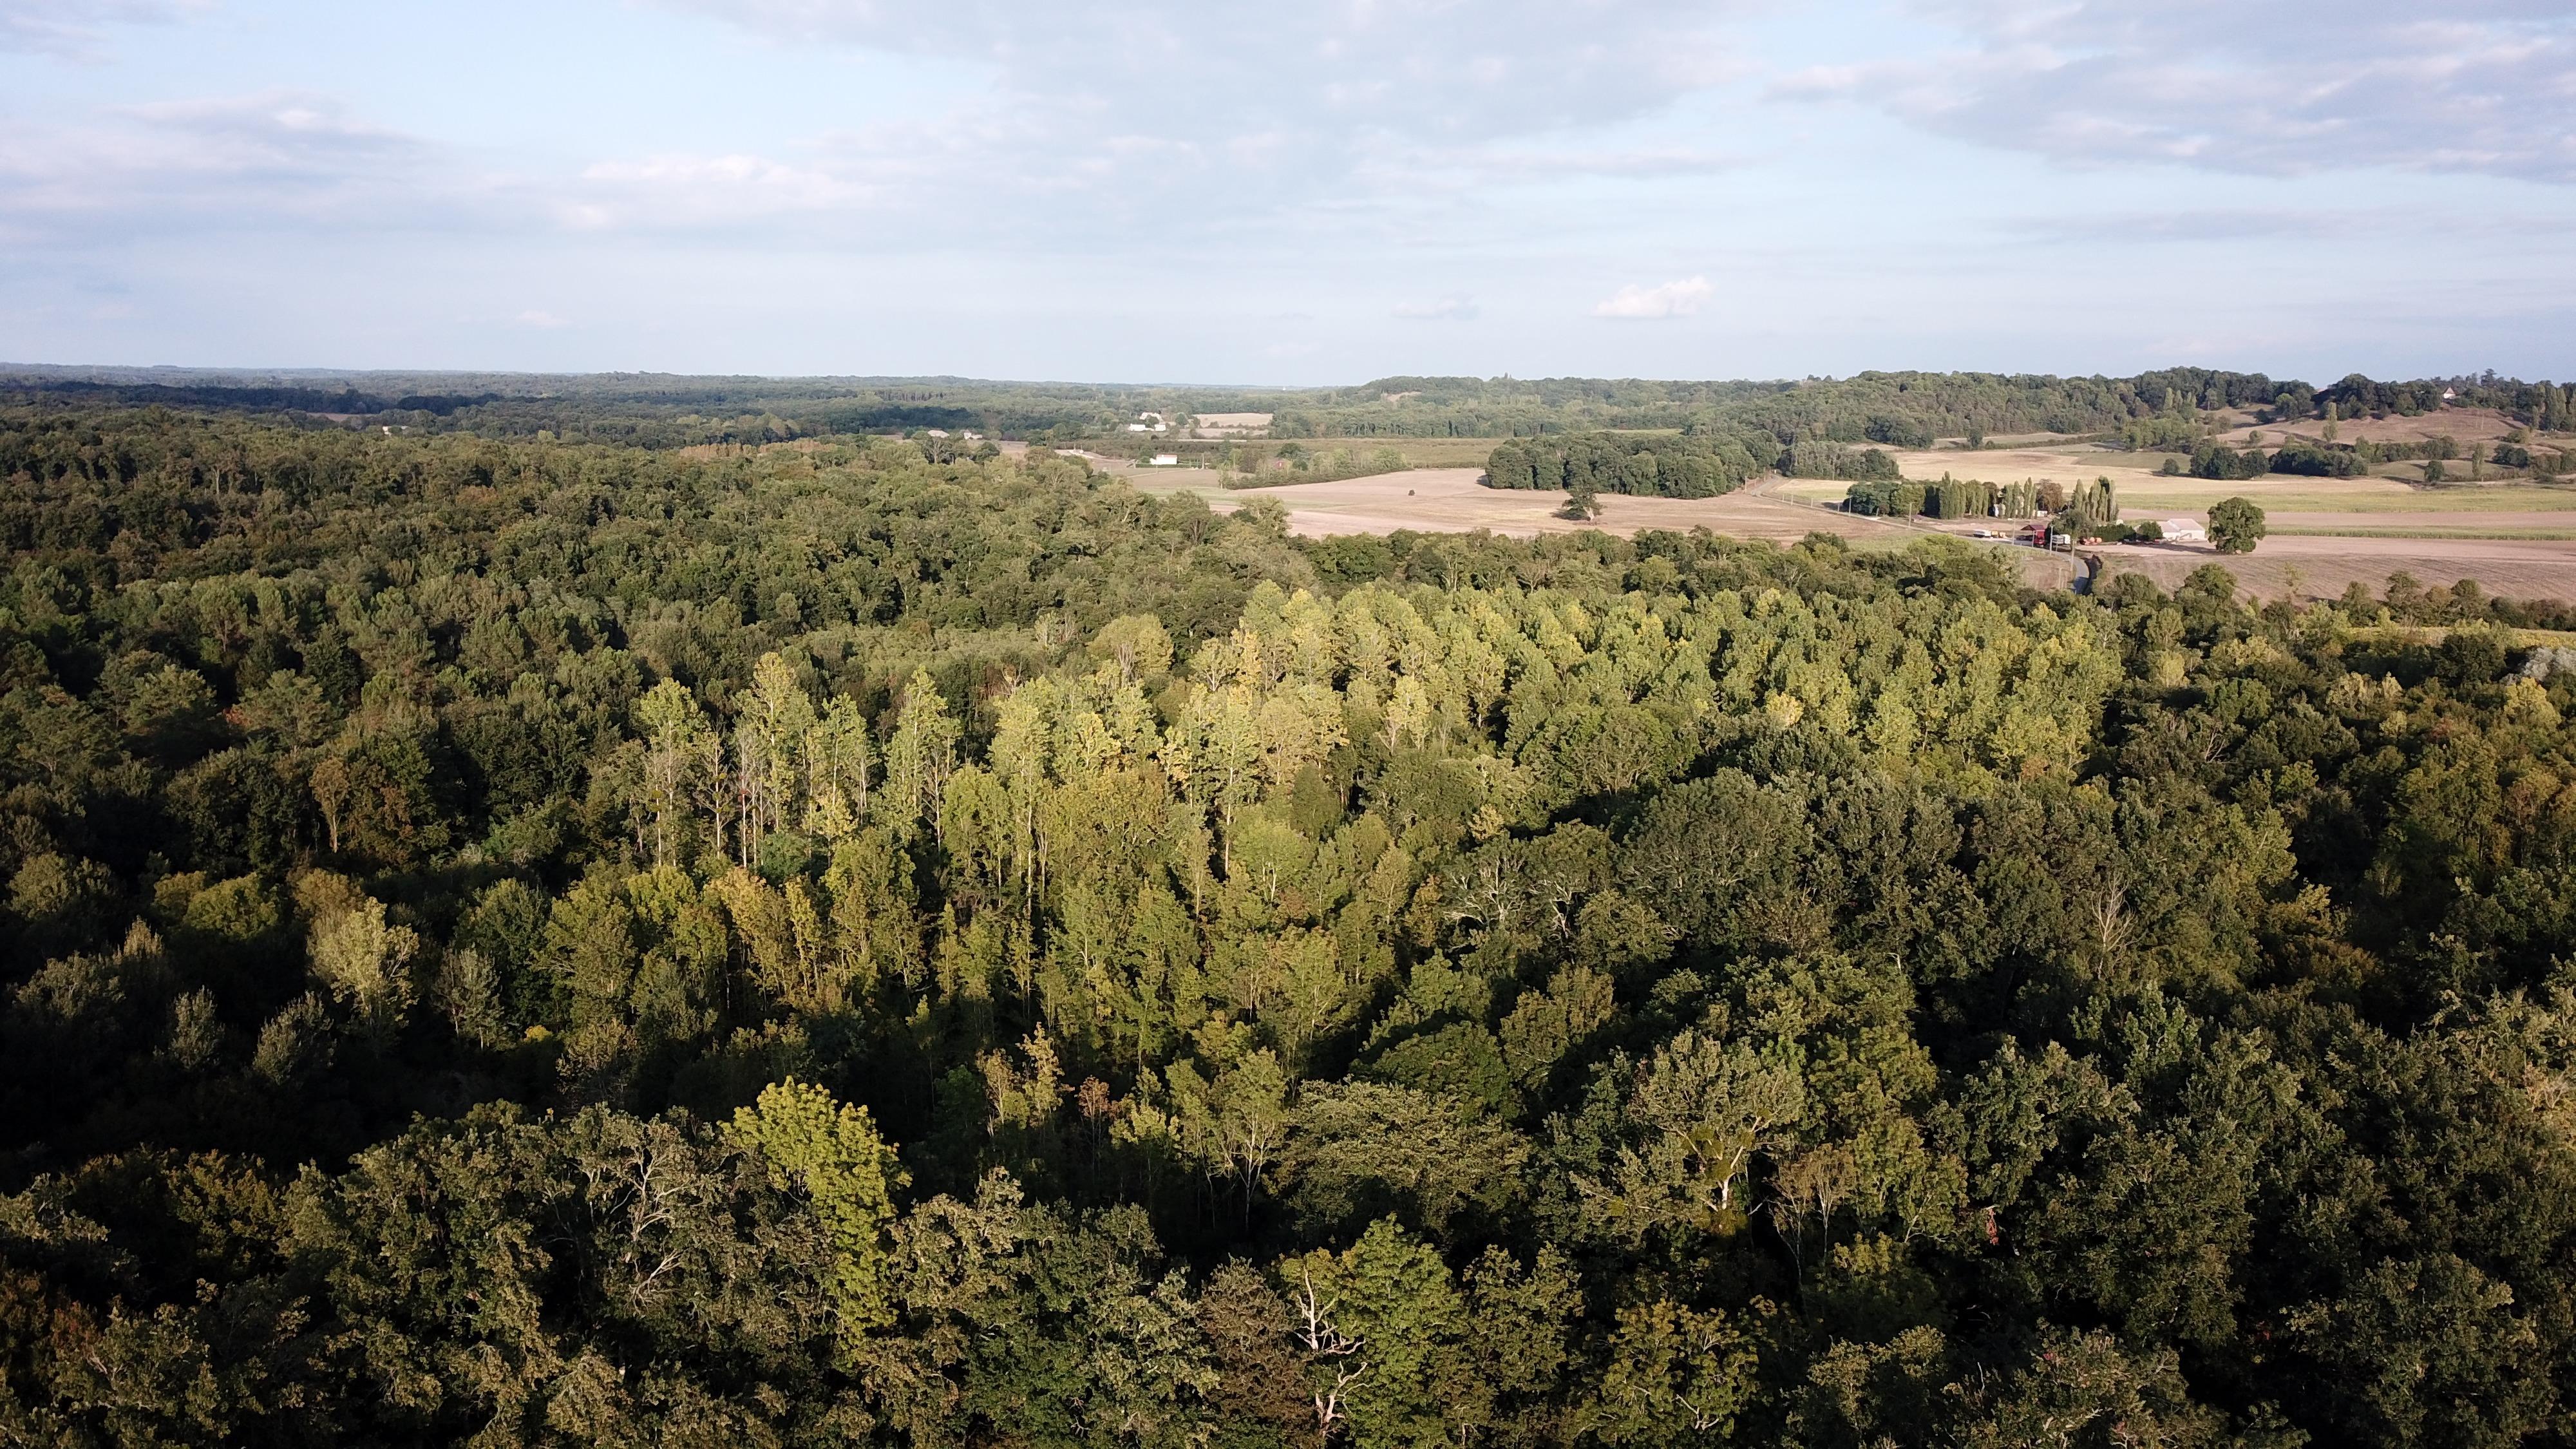 Domaine Forestier En Dordogne Limite Gironde Foret Investissement